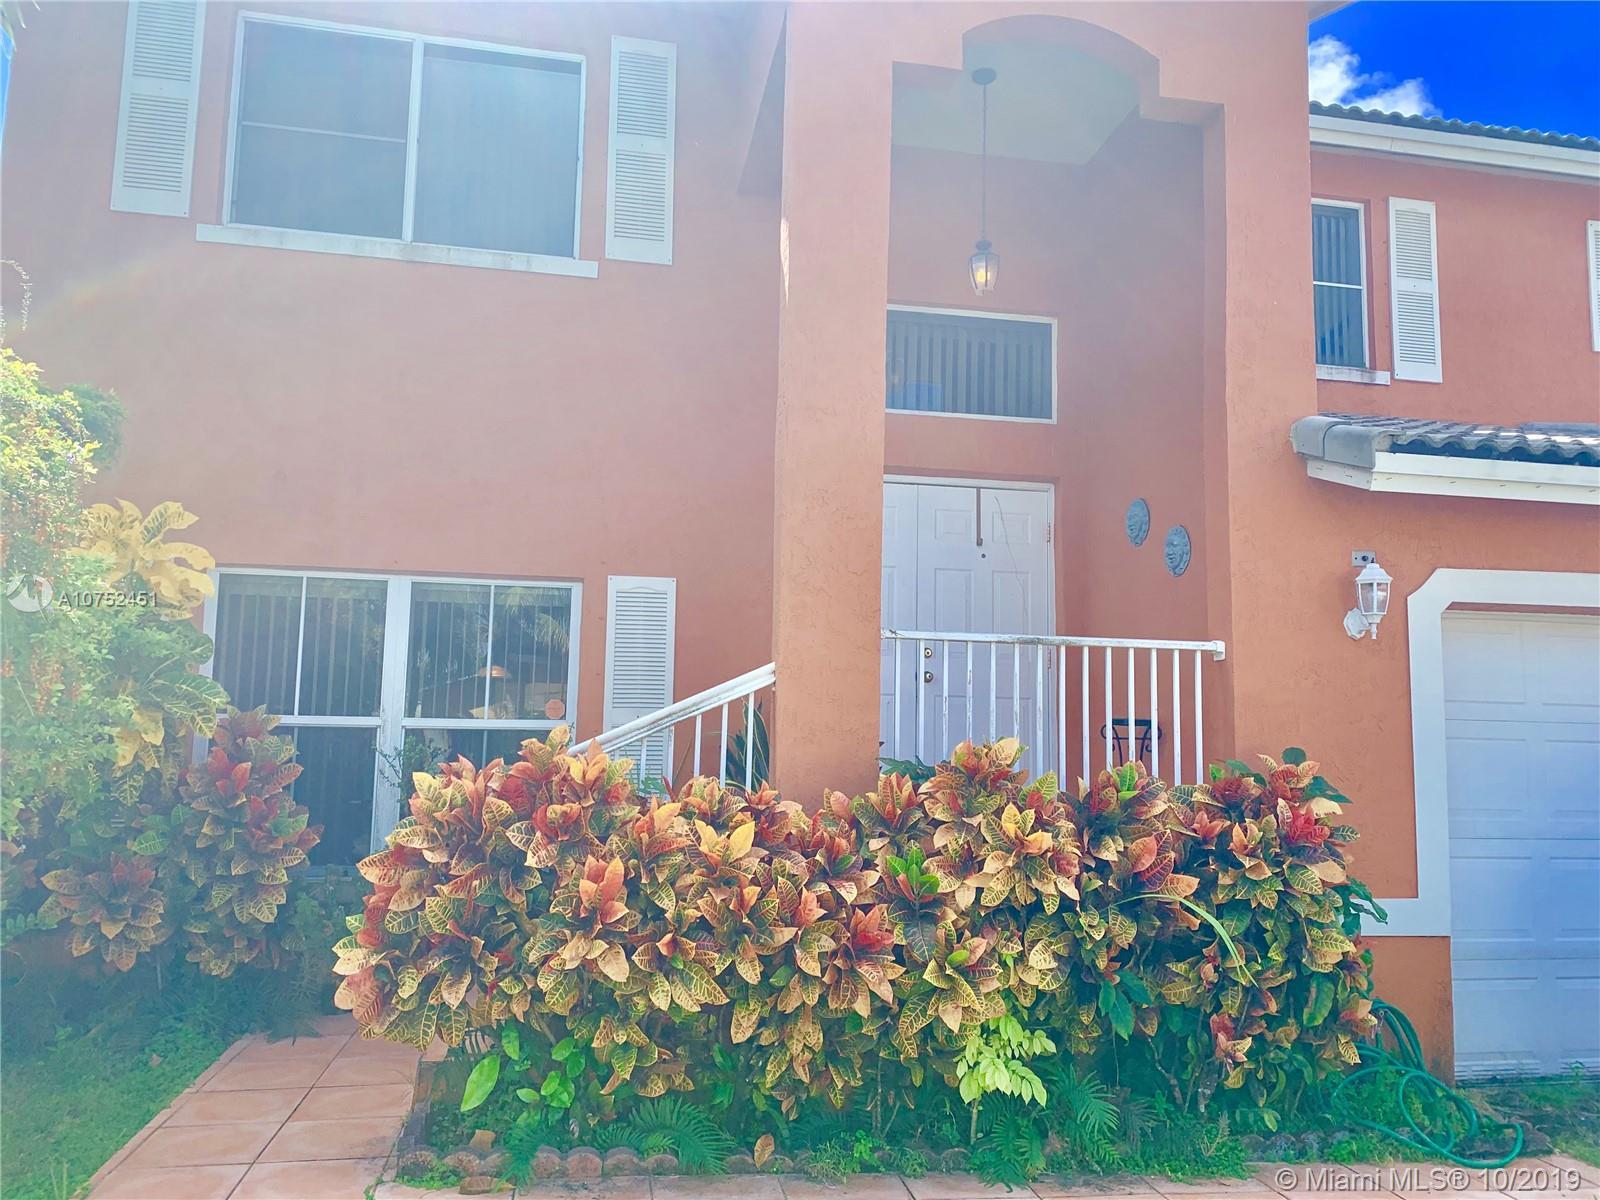 12078 249th St, Homestead, FL 33032 - Homestead, FL real estate listing